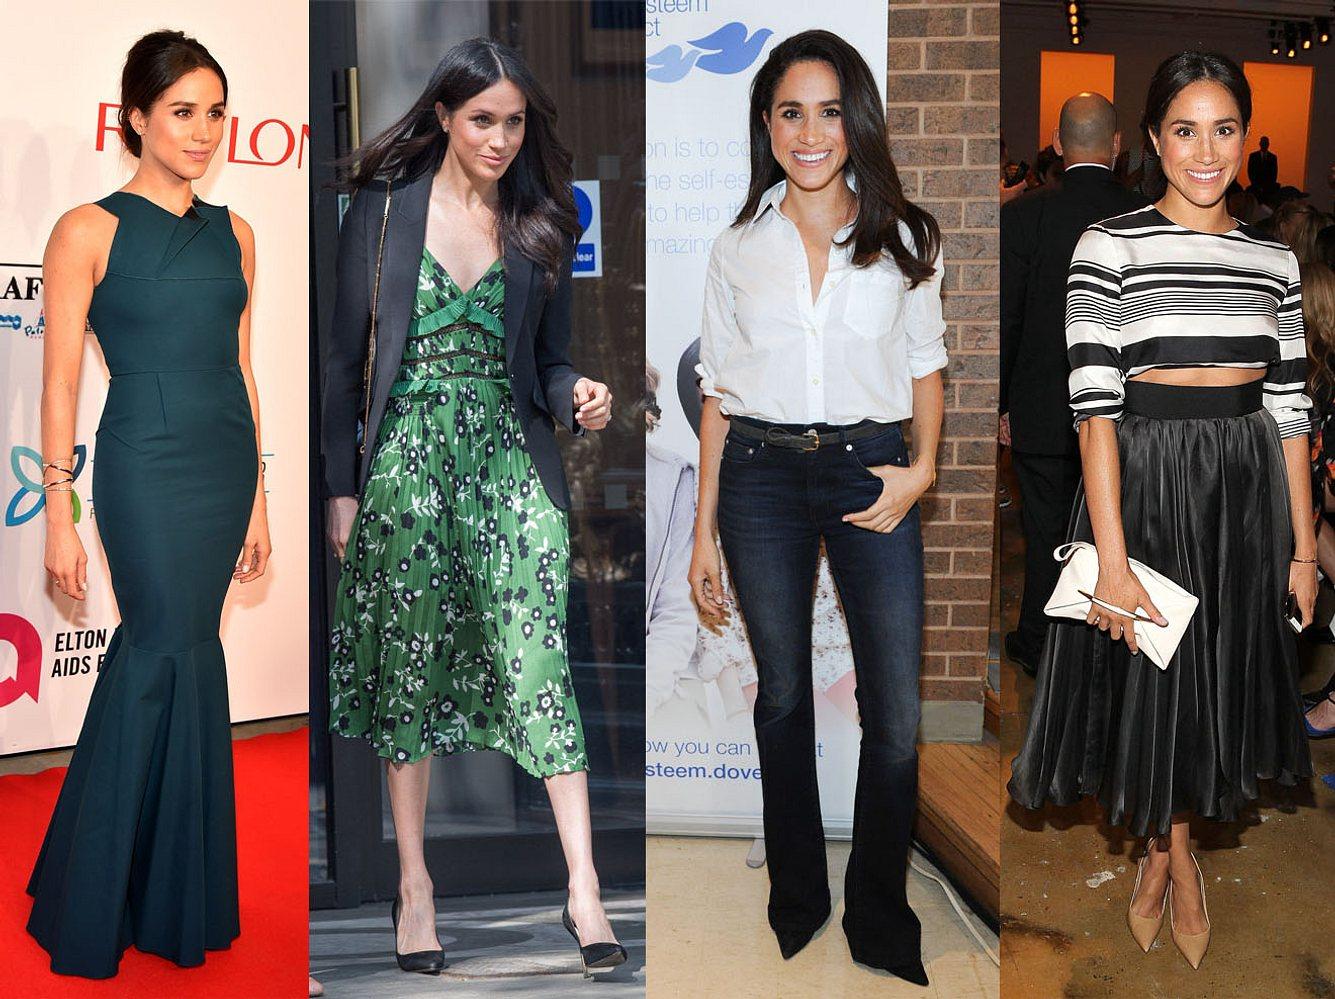 Meghan Markles Outfits beweisen Stil: Feminin oder lässig-elegant - Meghans Style beeindruckt.